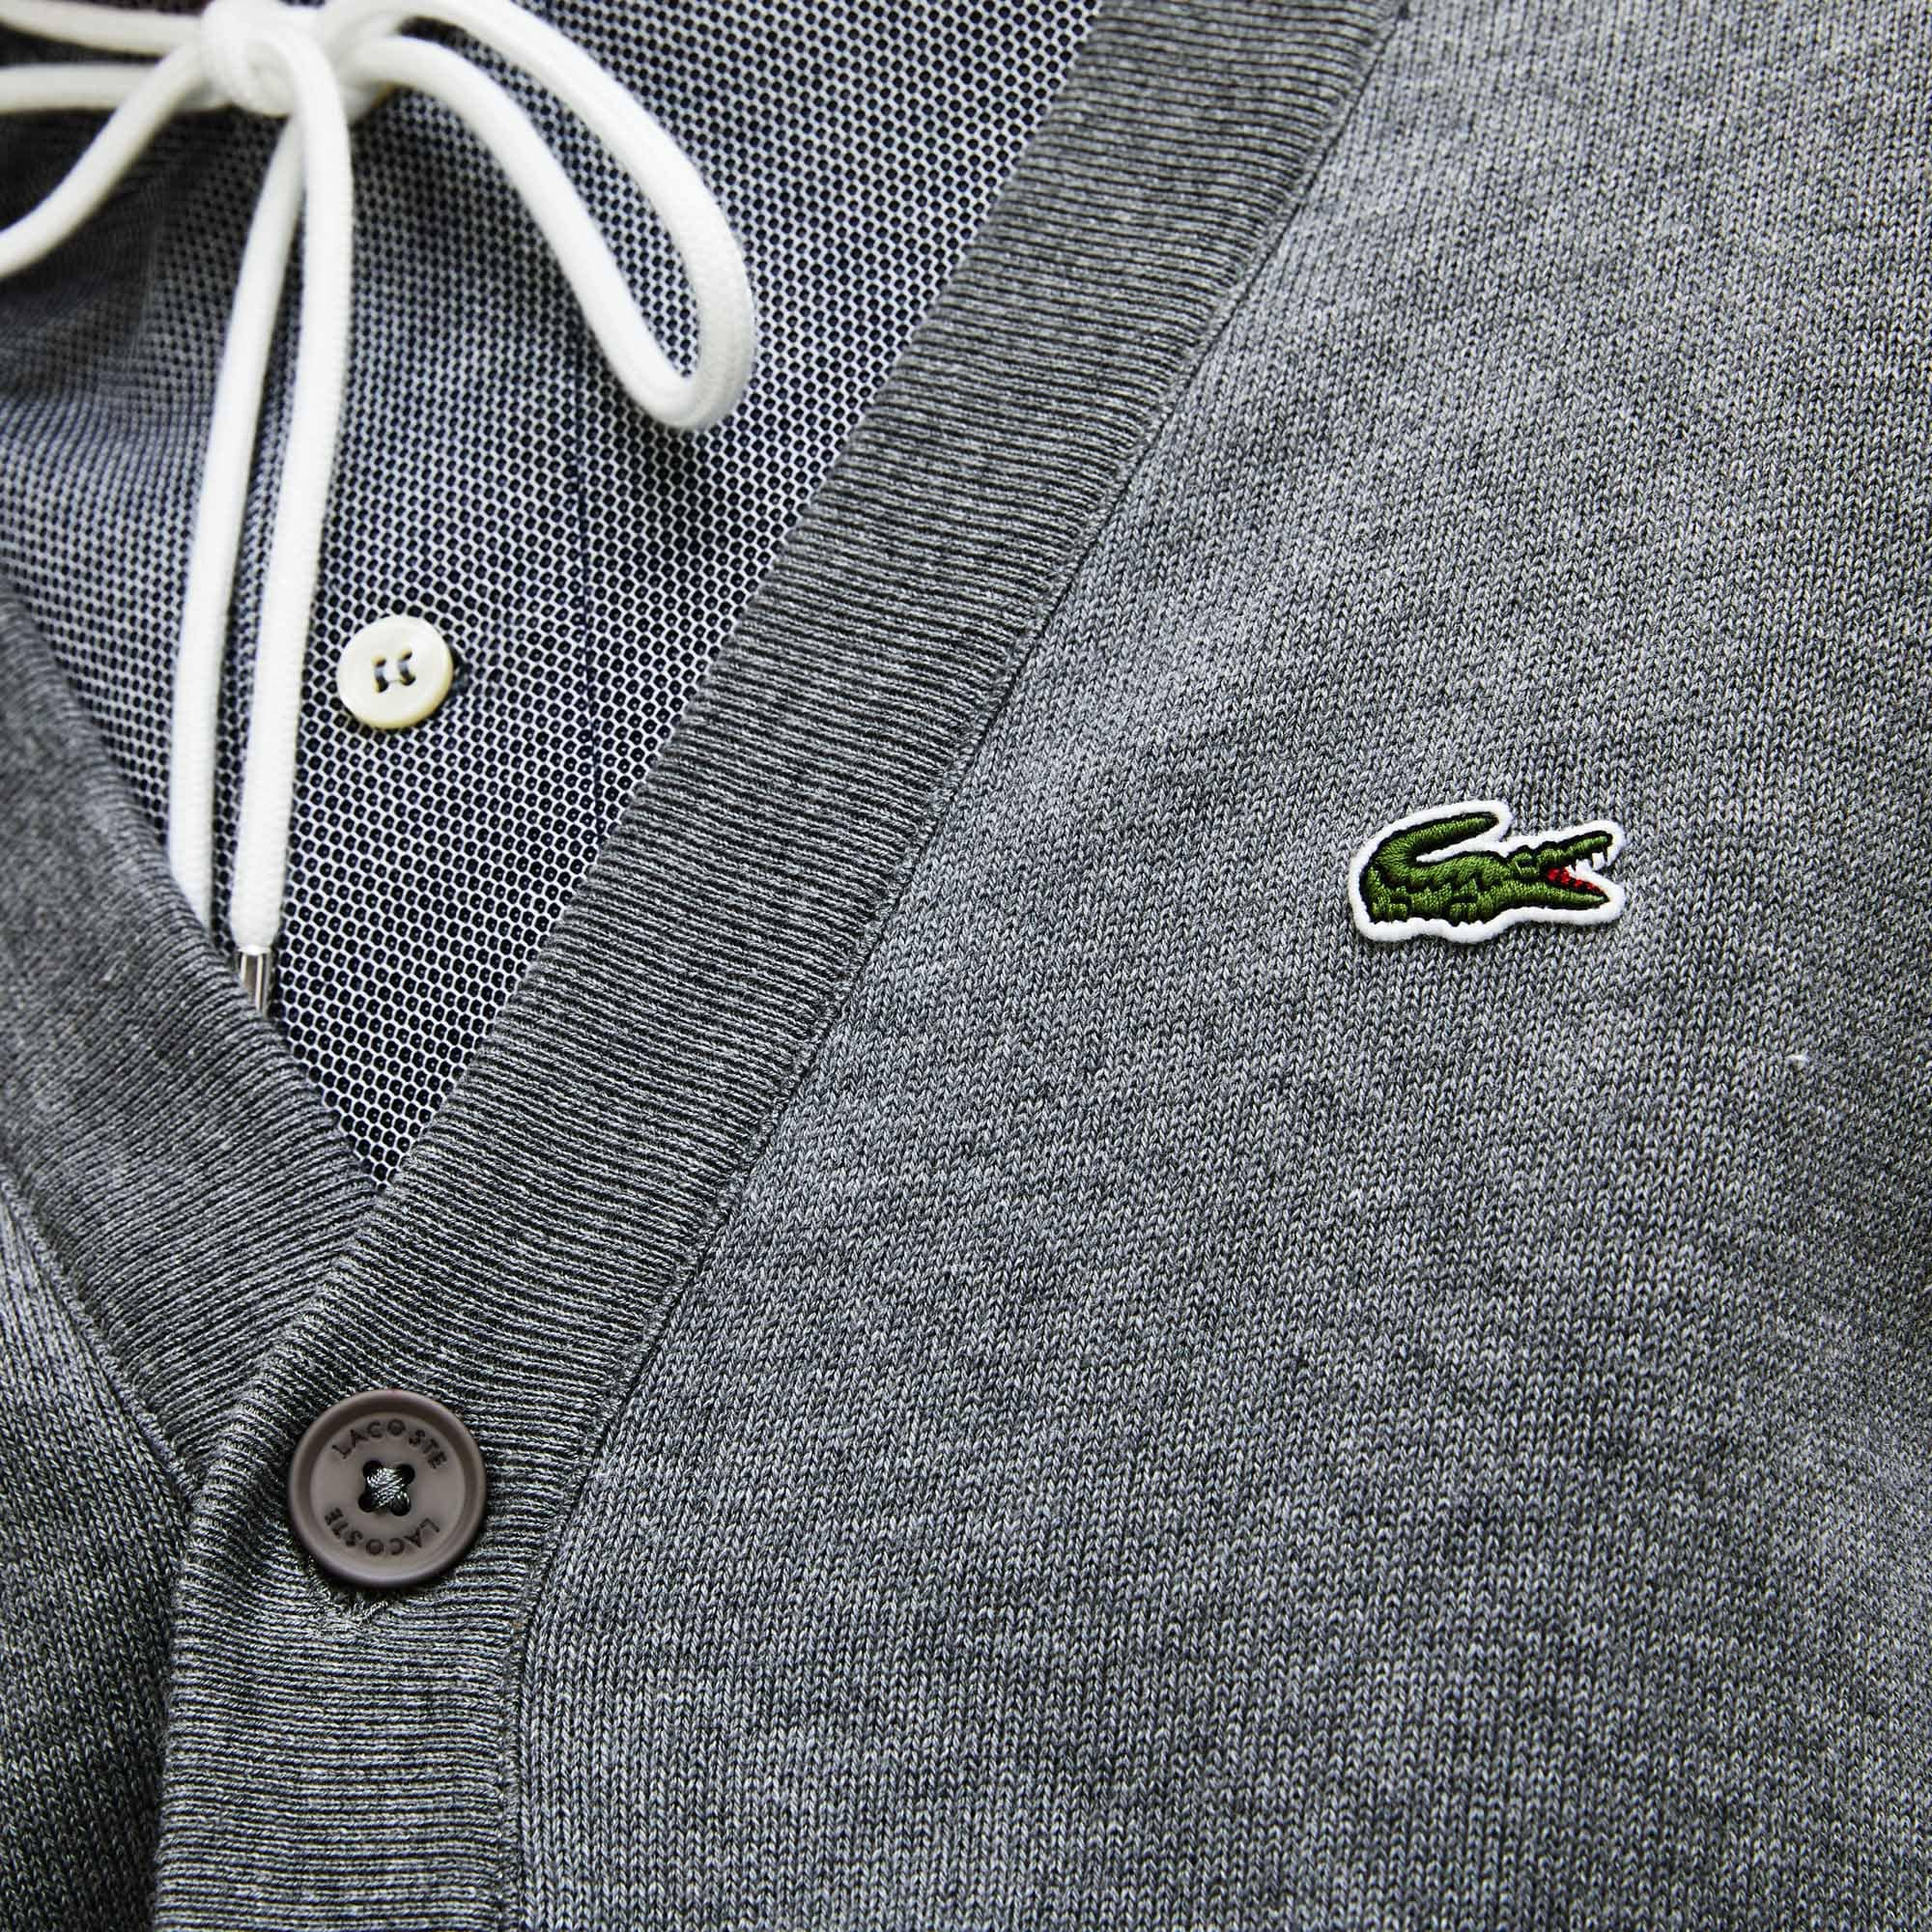 b417b10f8b Men's Cotton Jersey Cardigan